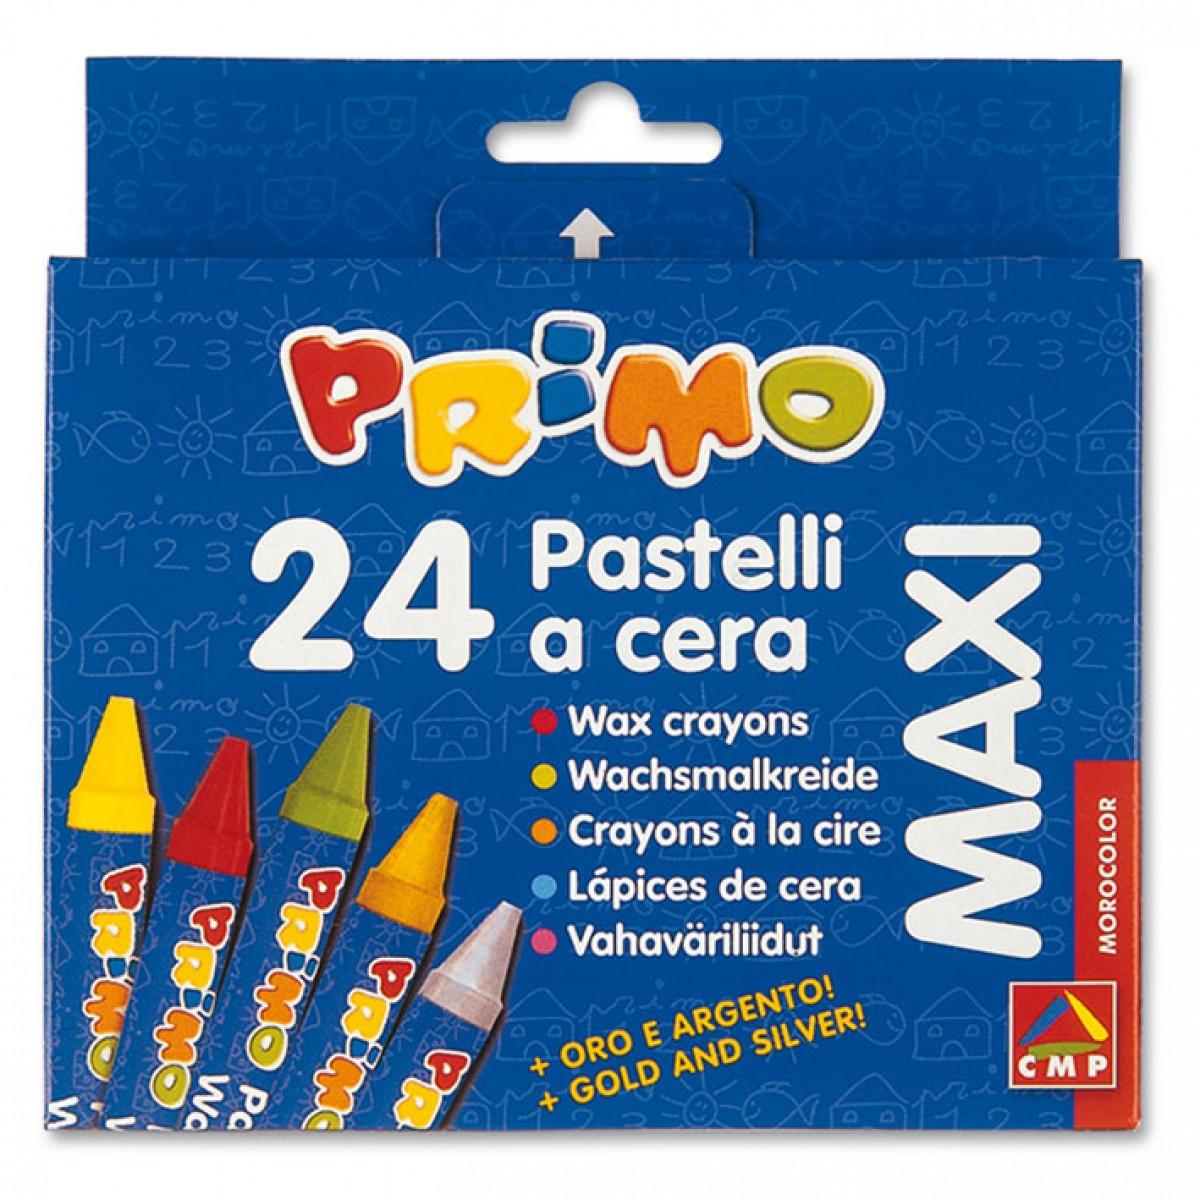 Primo Κηρομπογιές Maxi (24 Τεμ.) Κηρομπογιές